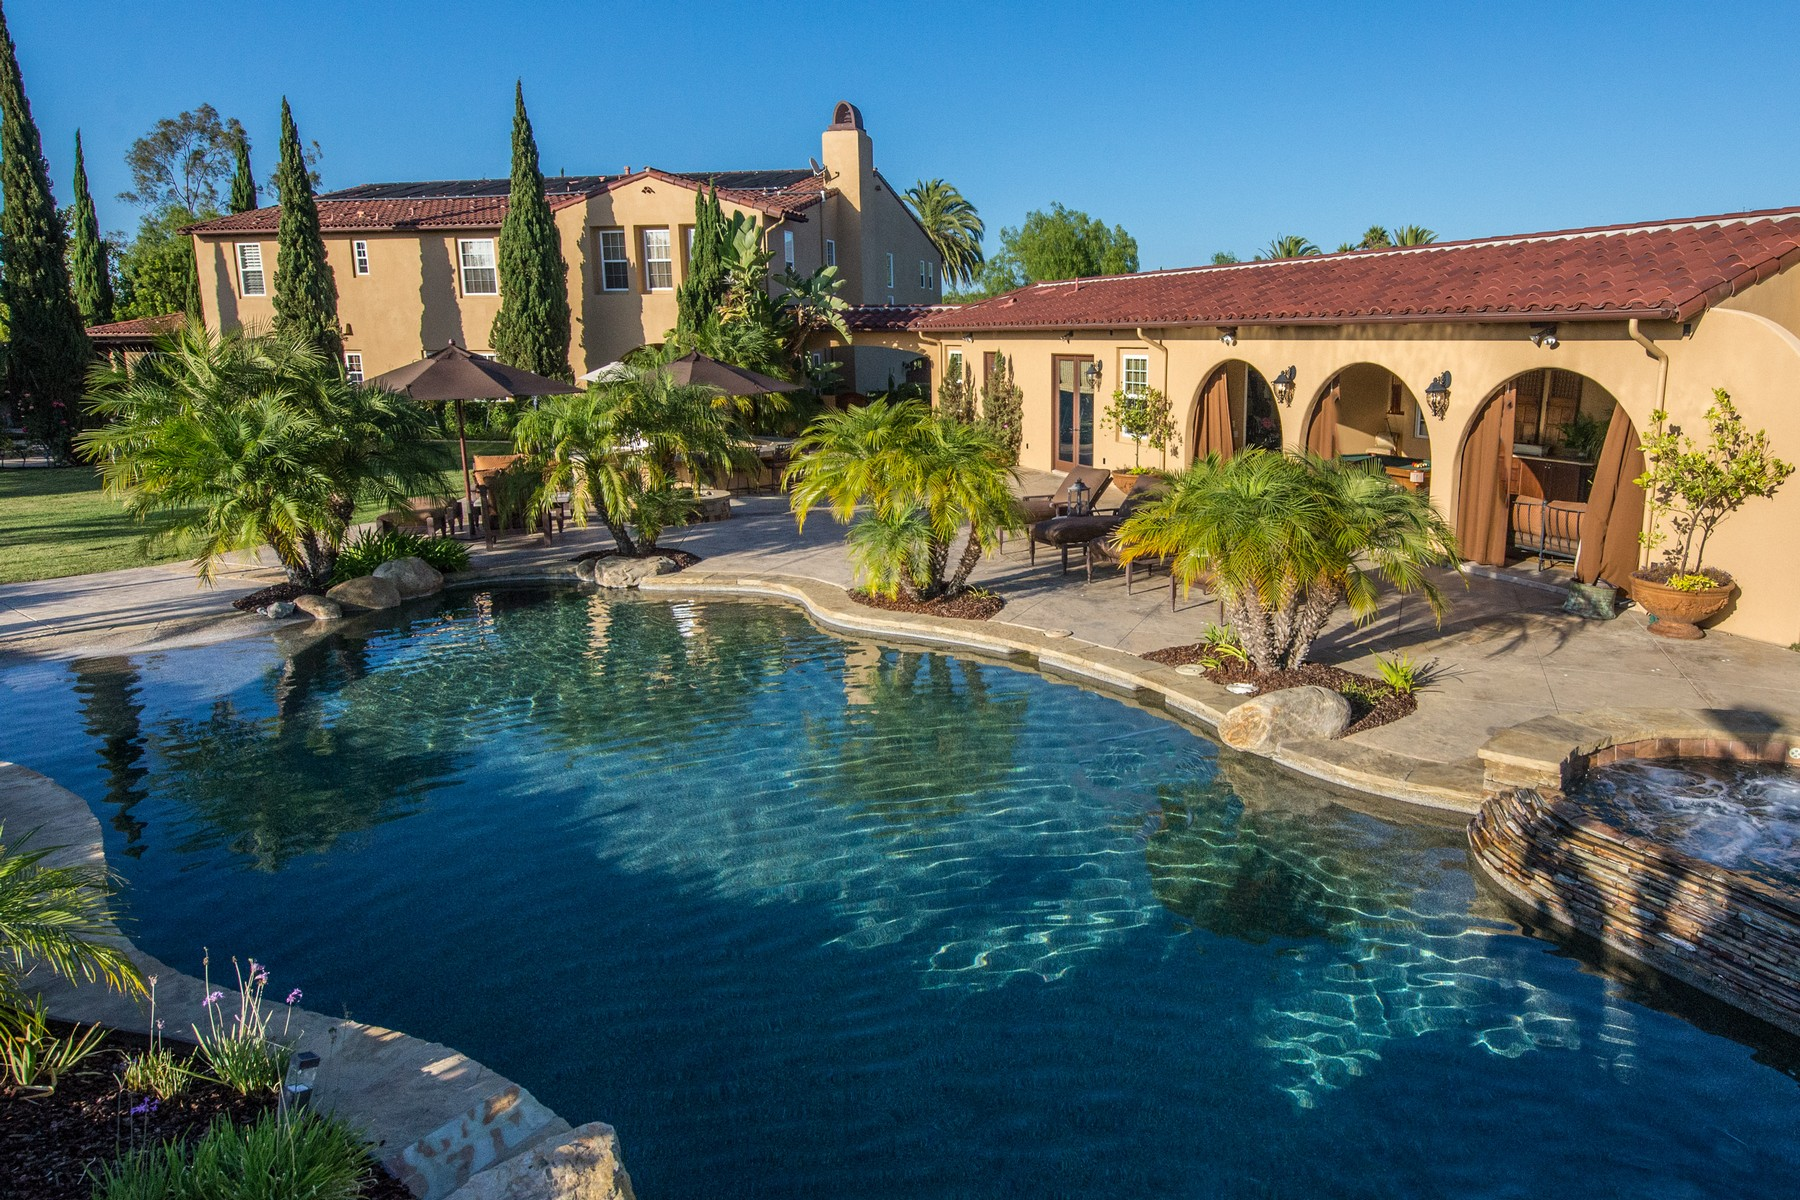 Single Family Home for Sale at 14126 Caminito Vistana San Diego, California 92130 United States